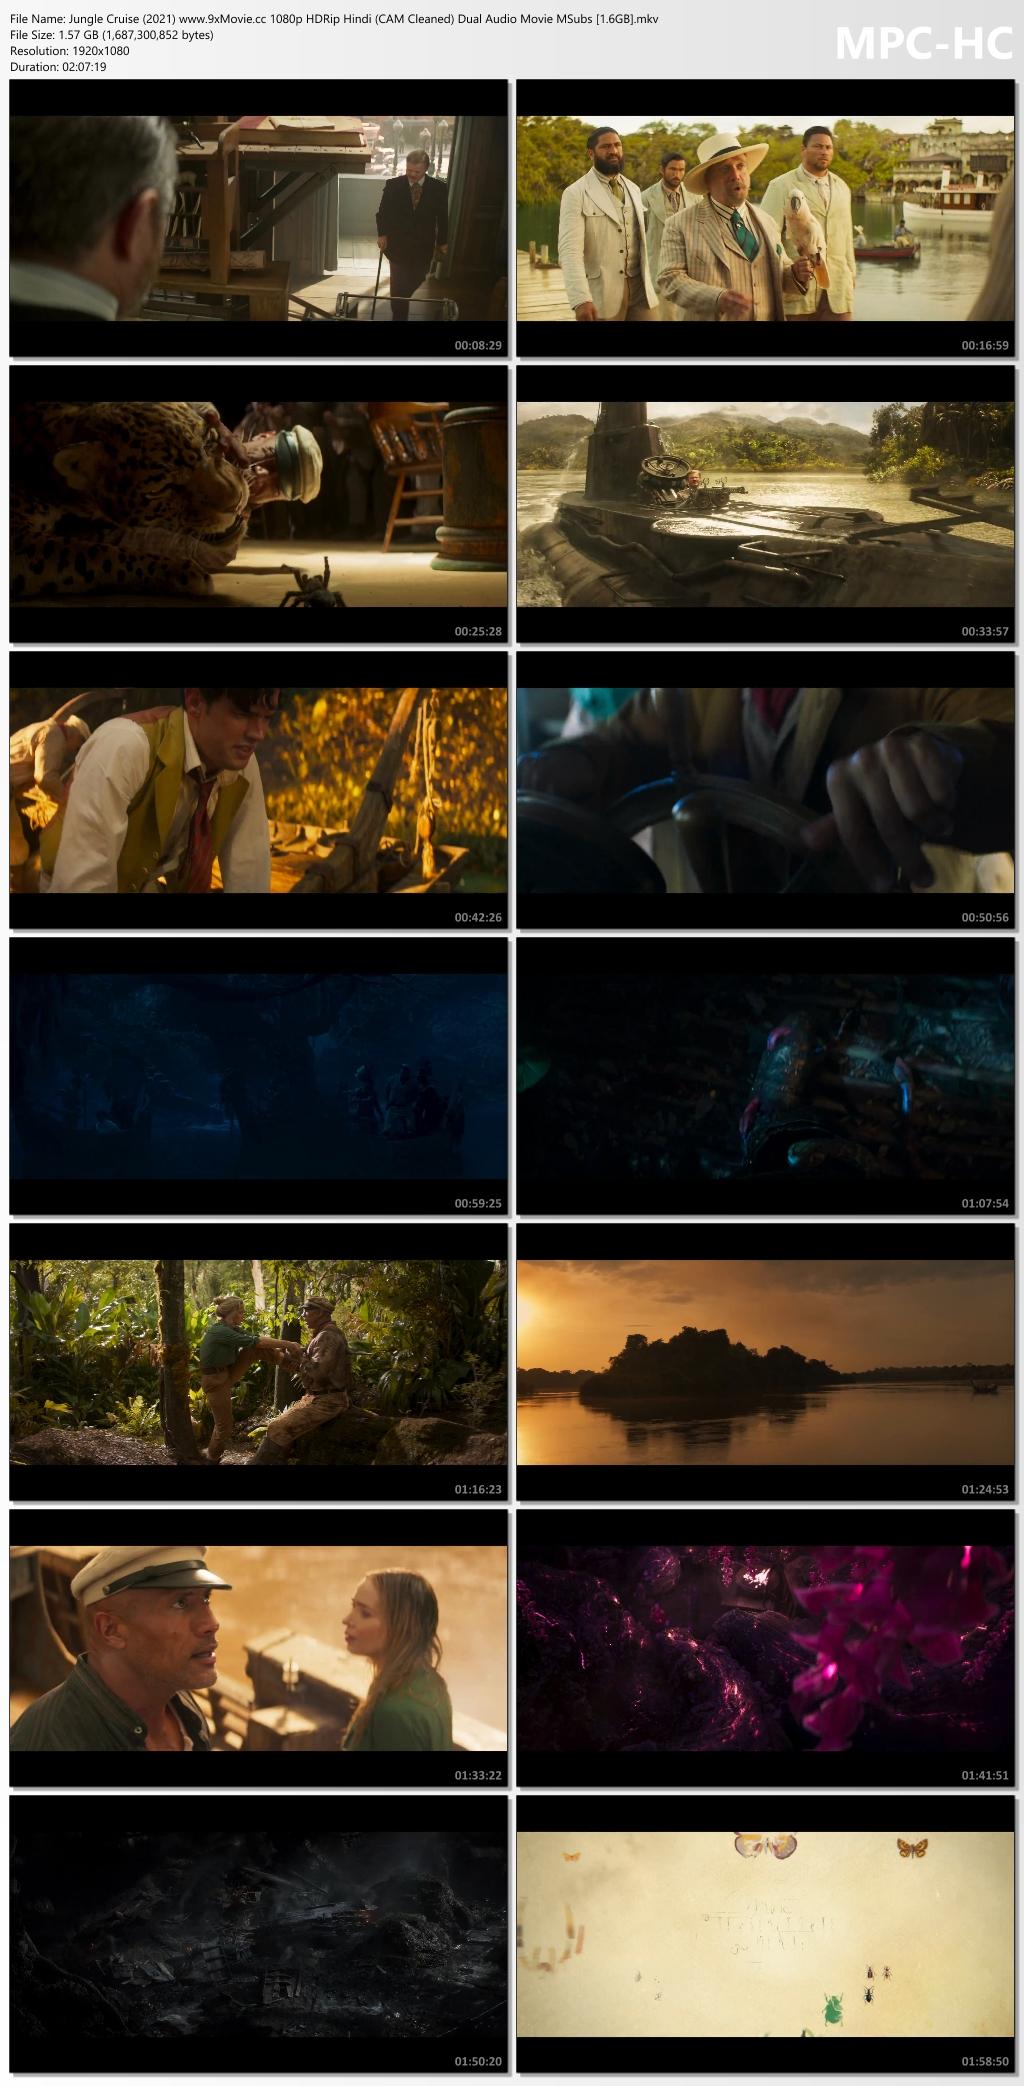 Jungle-Cruise-2021-www-9x-Movie-cc-1080p-HDRip-Hindi-CAM-Cleaned-Dual-Audio-Movie-MSubs-1-6-GB-mkv